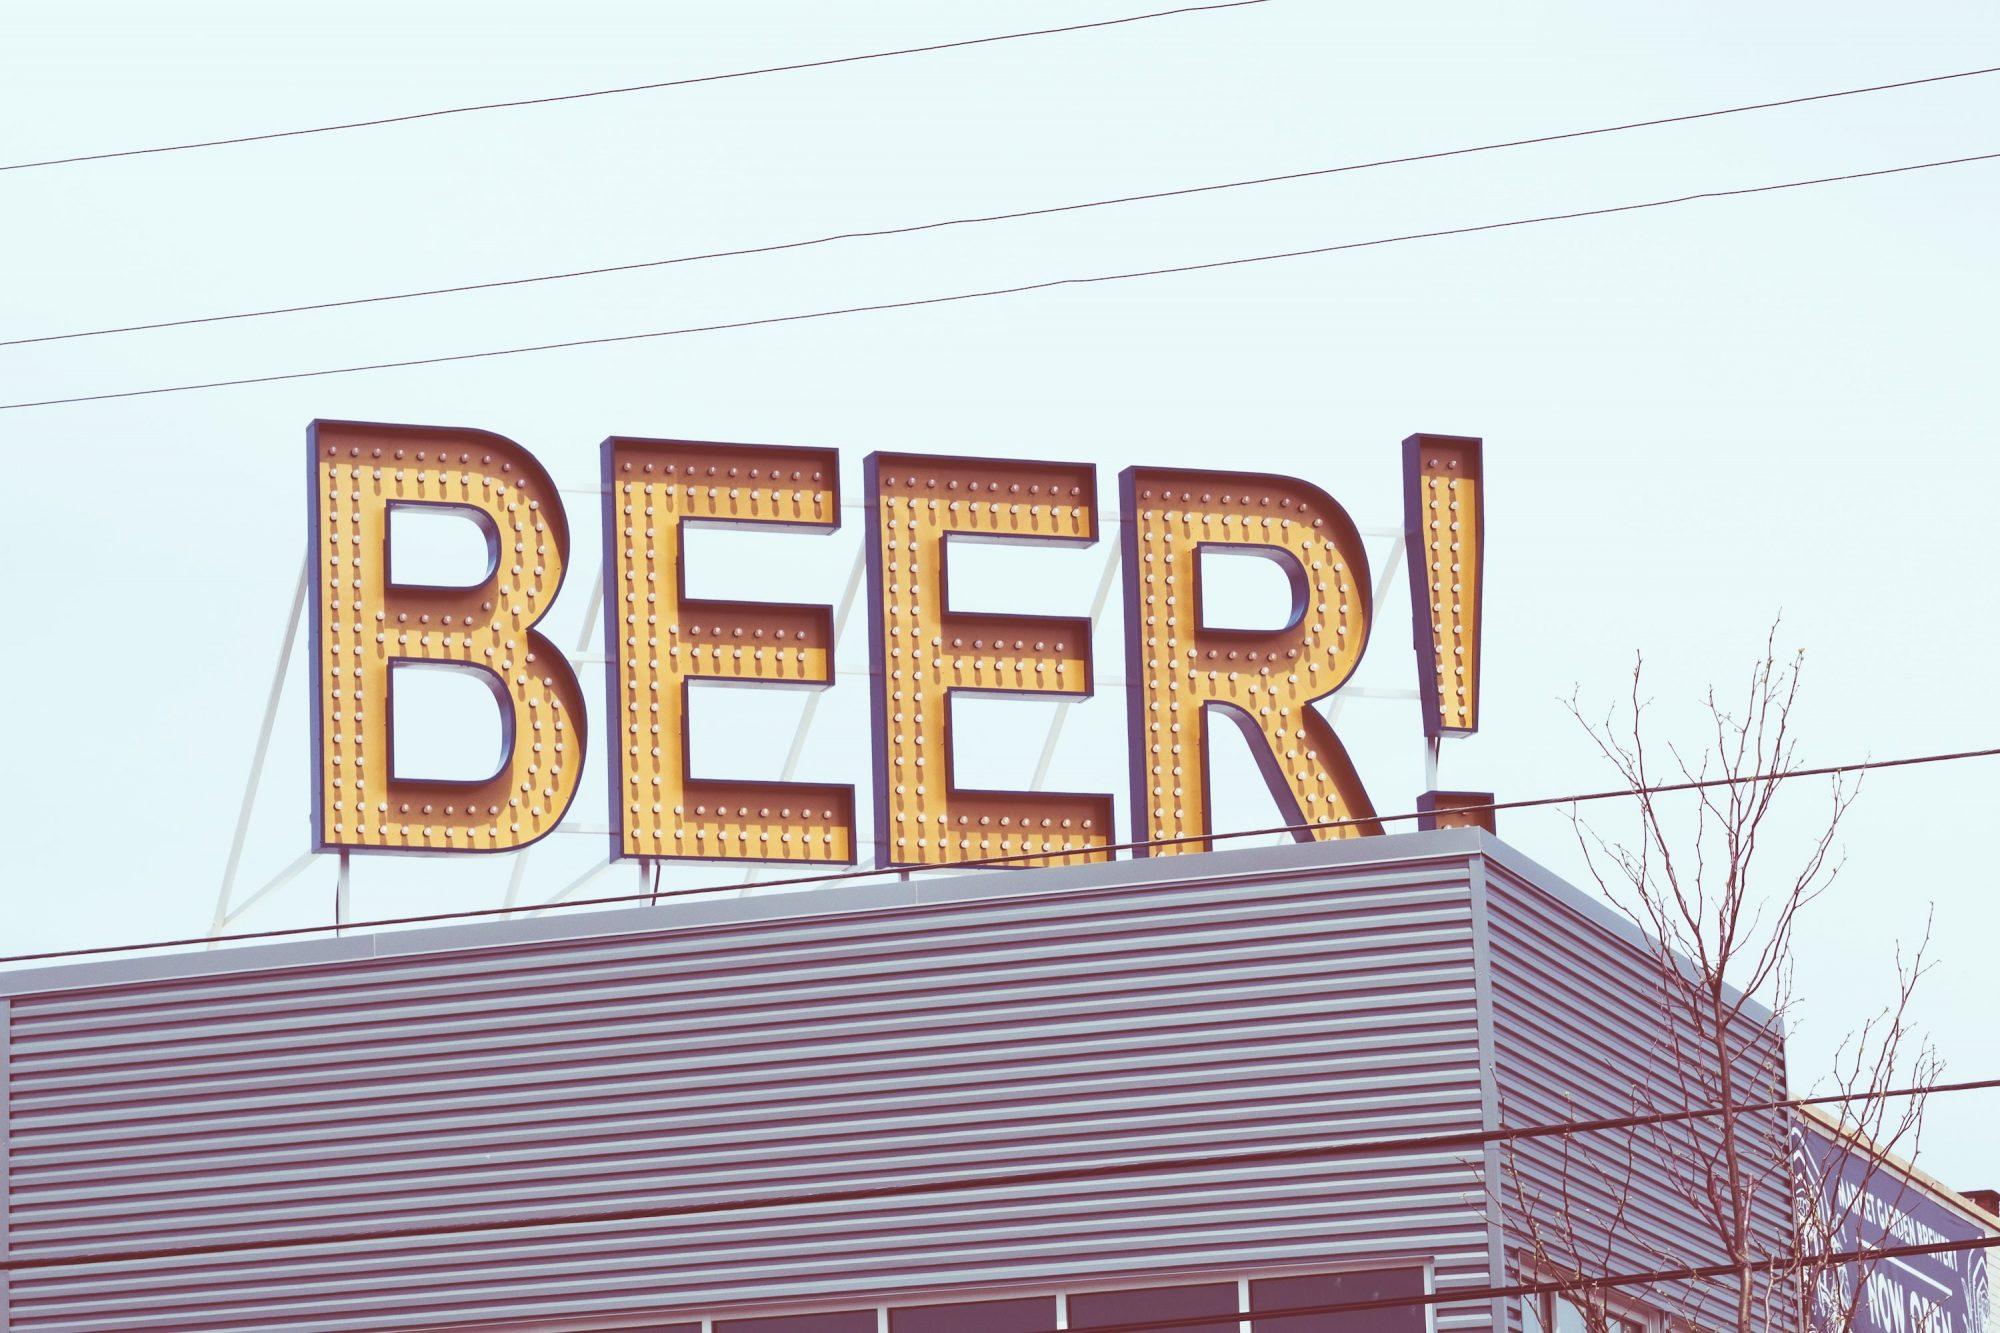 insigne beer - comment choisir et deguster une biere